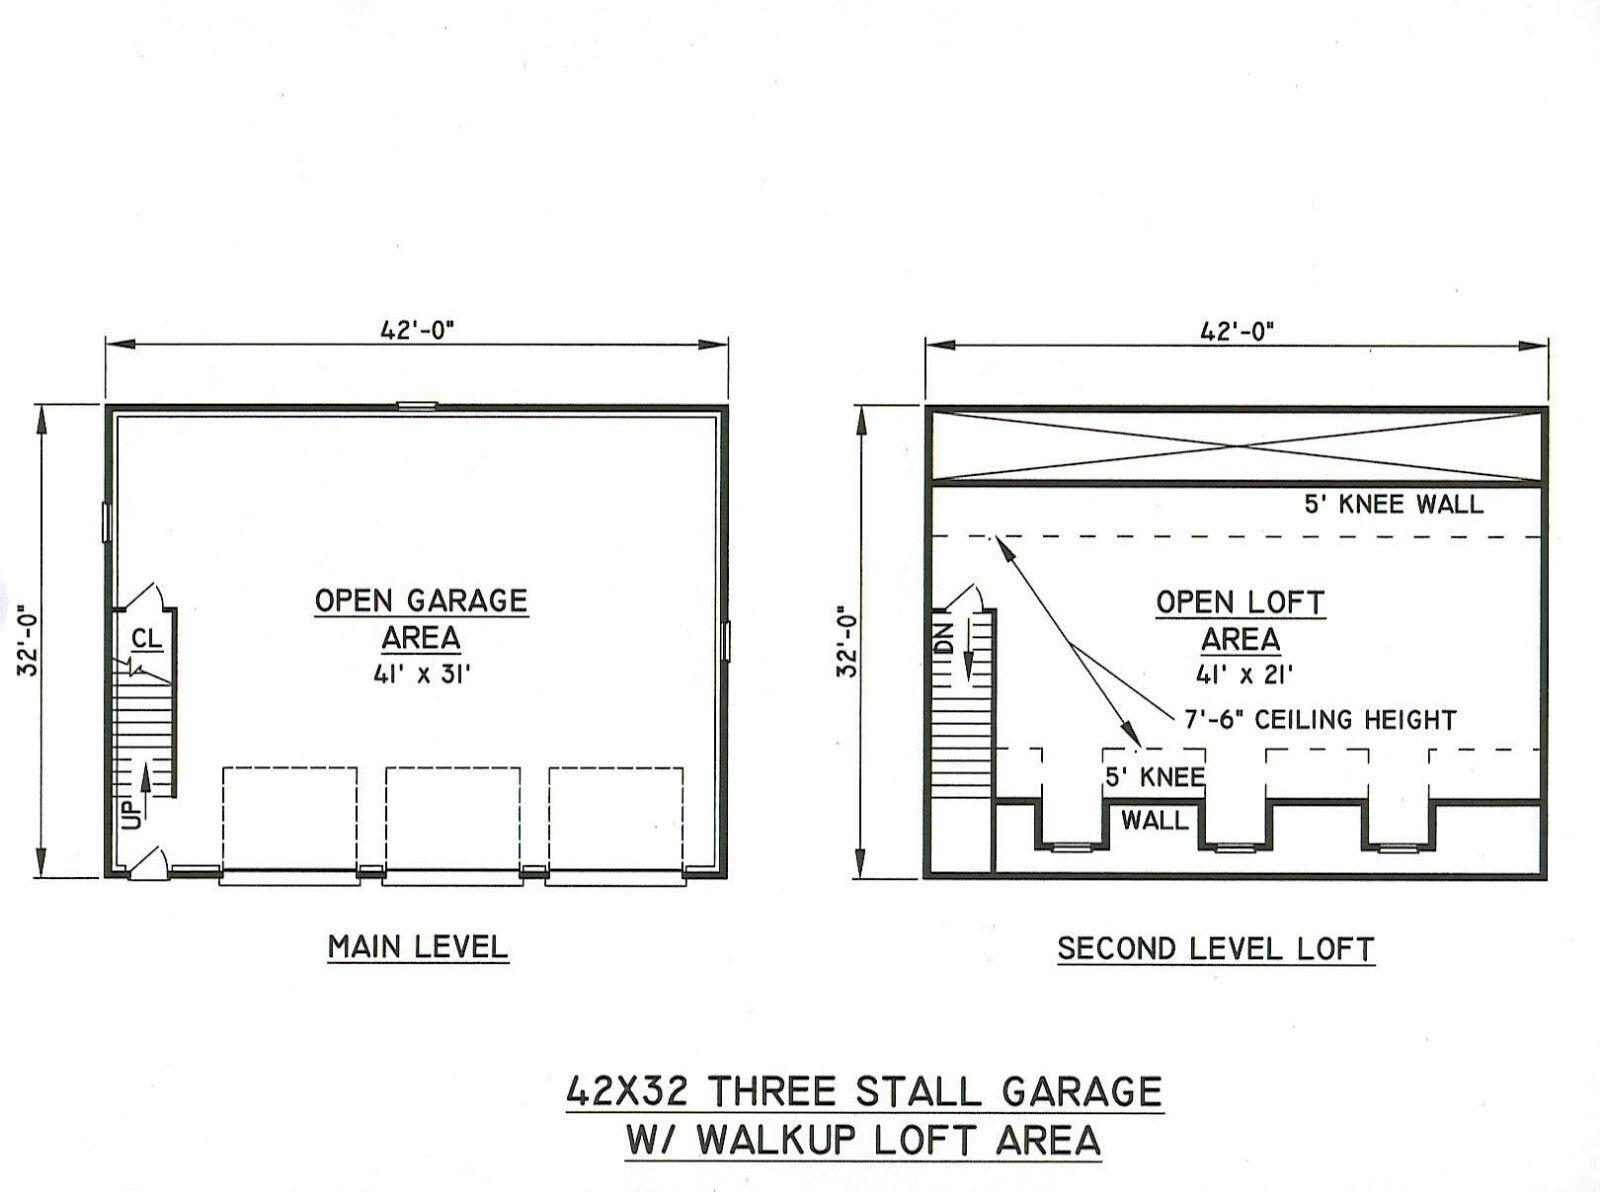 42x32 3 Car Garage Building Blueprint Plans With Walk Up